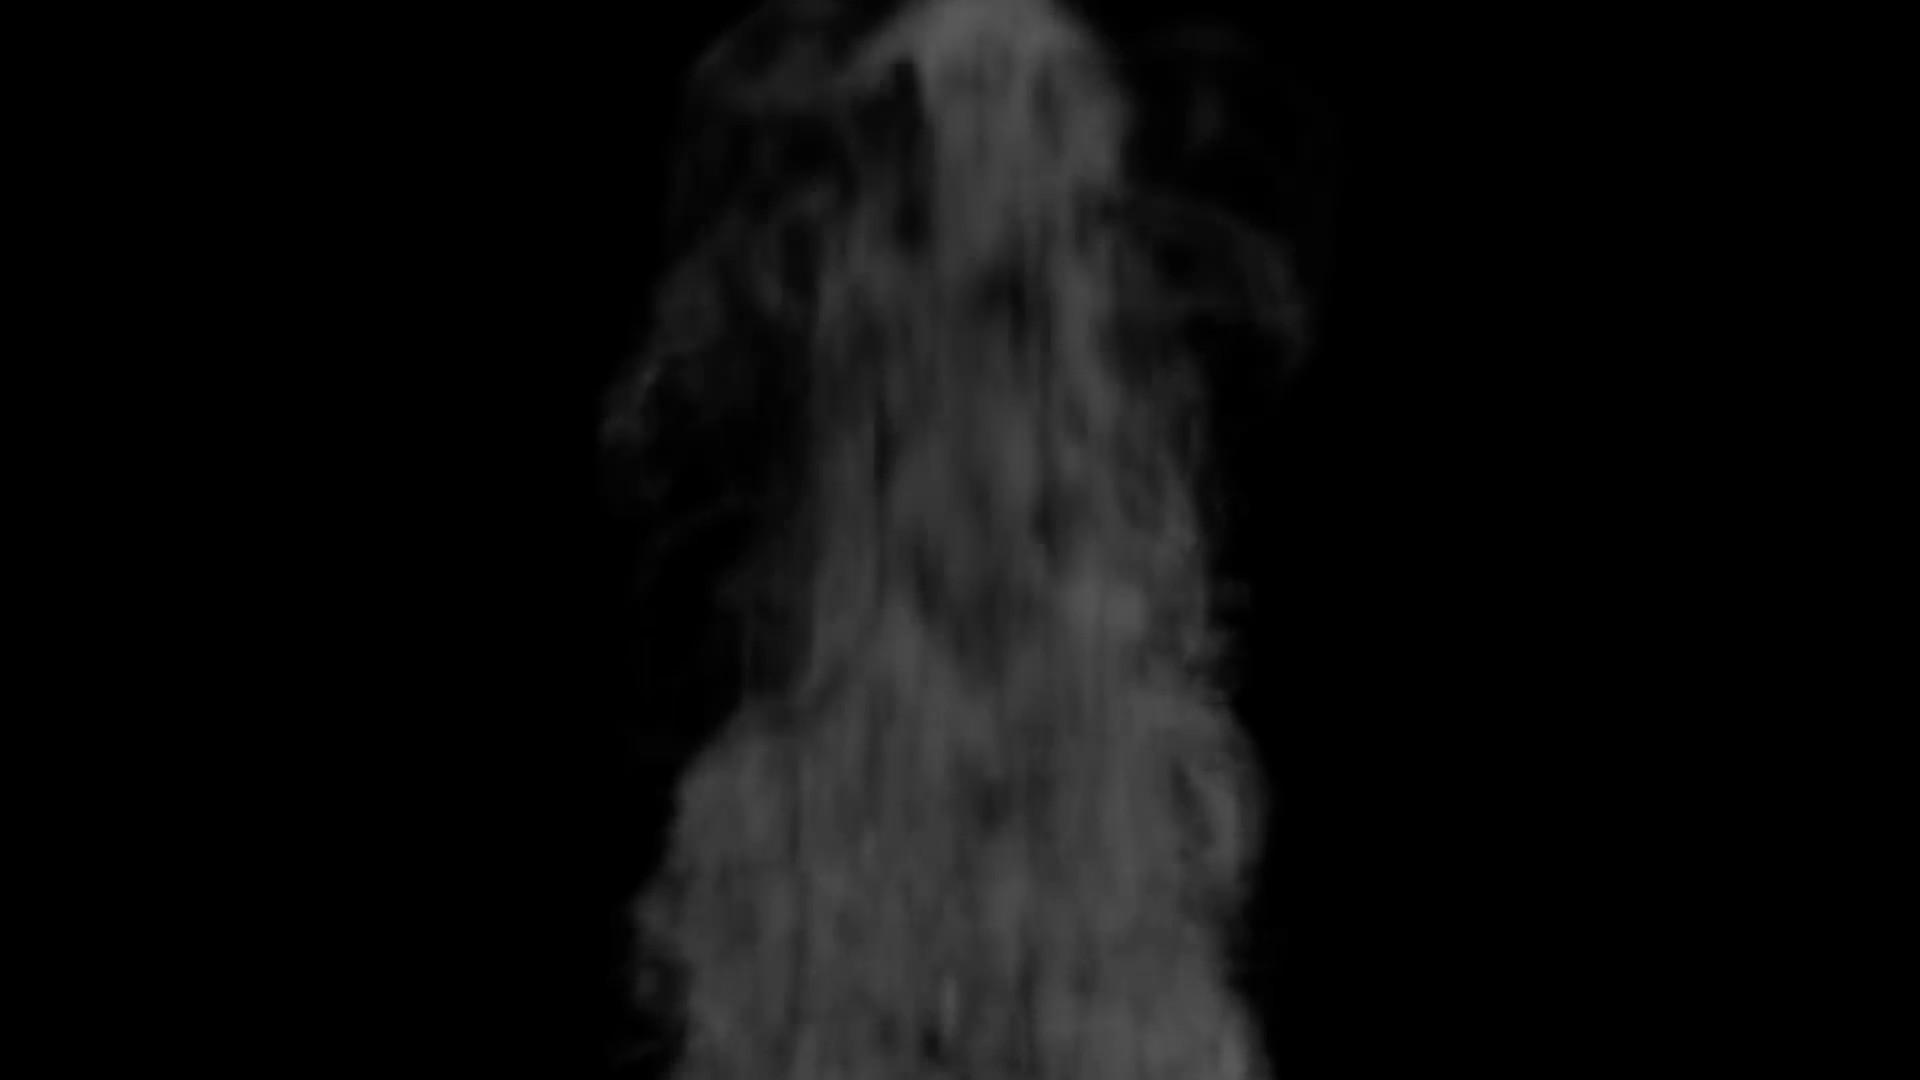 Animated realistic smoke on transparent background 2. Motion Background –  VideoBlocks